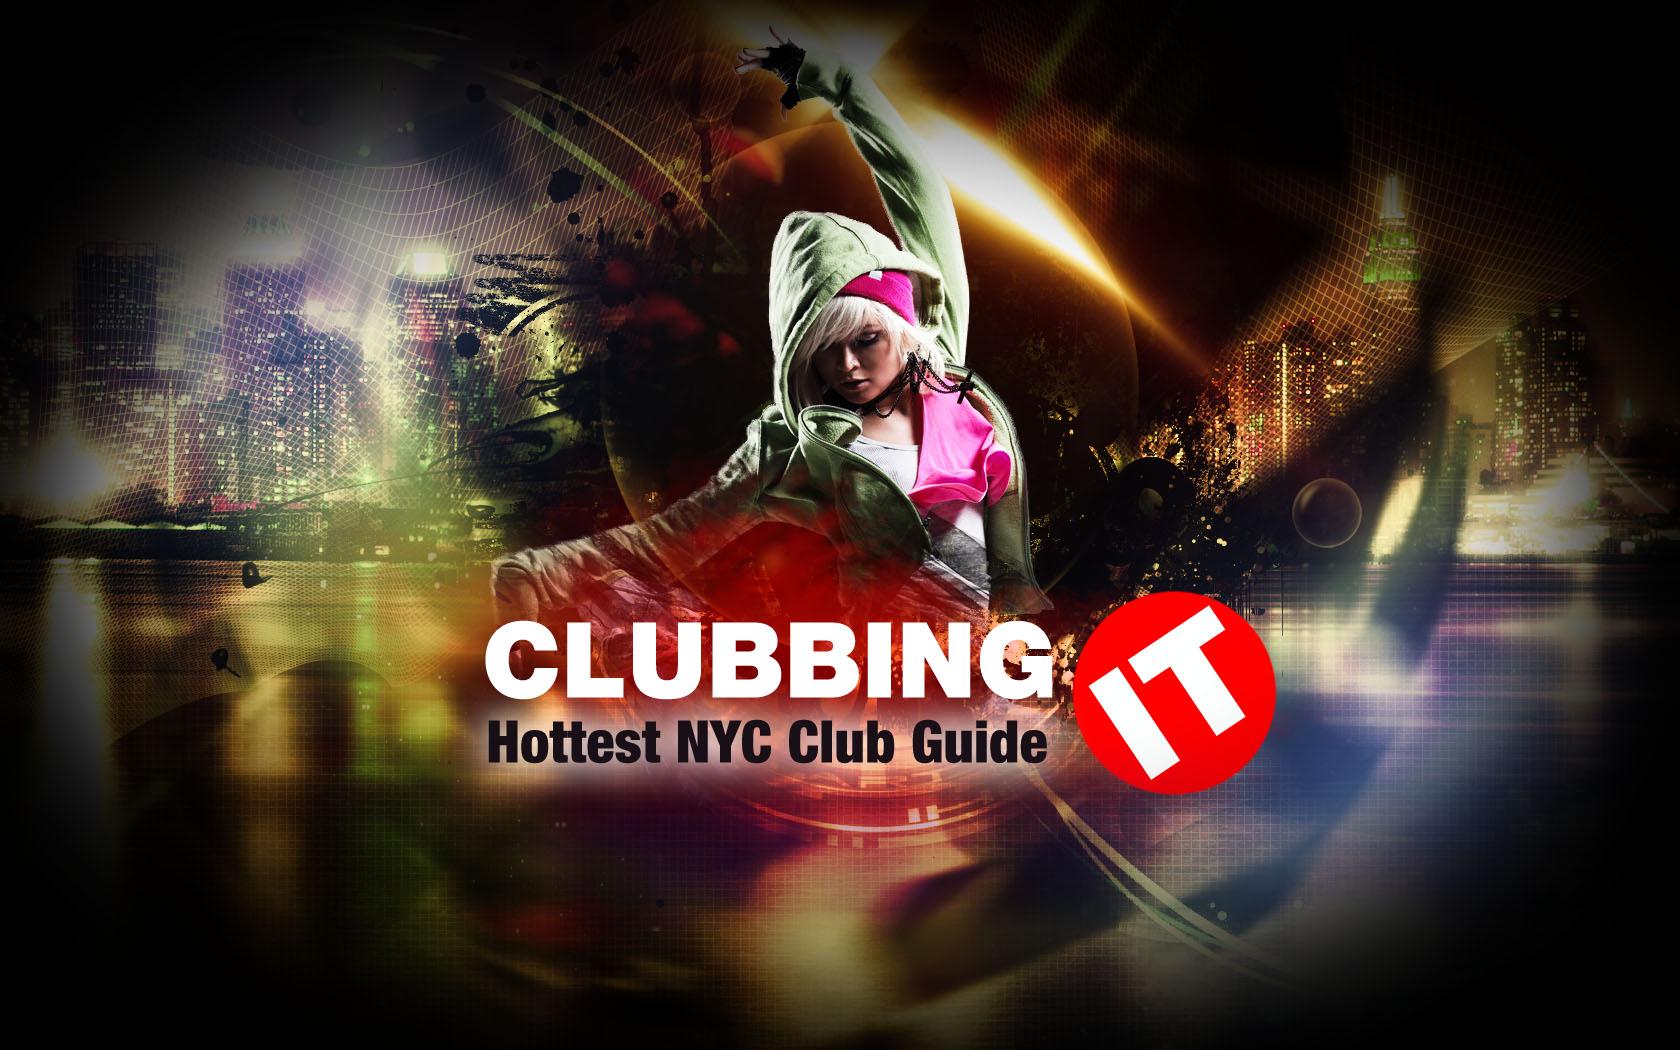 Clubbing IT TV series trailer post production